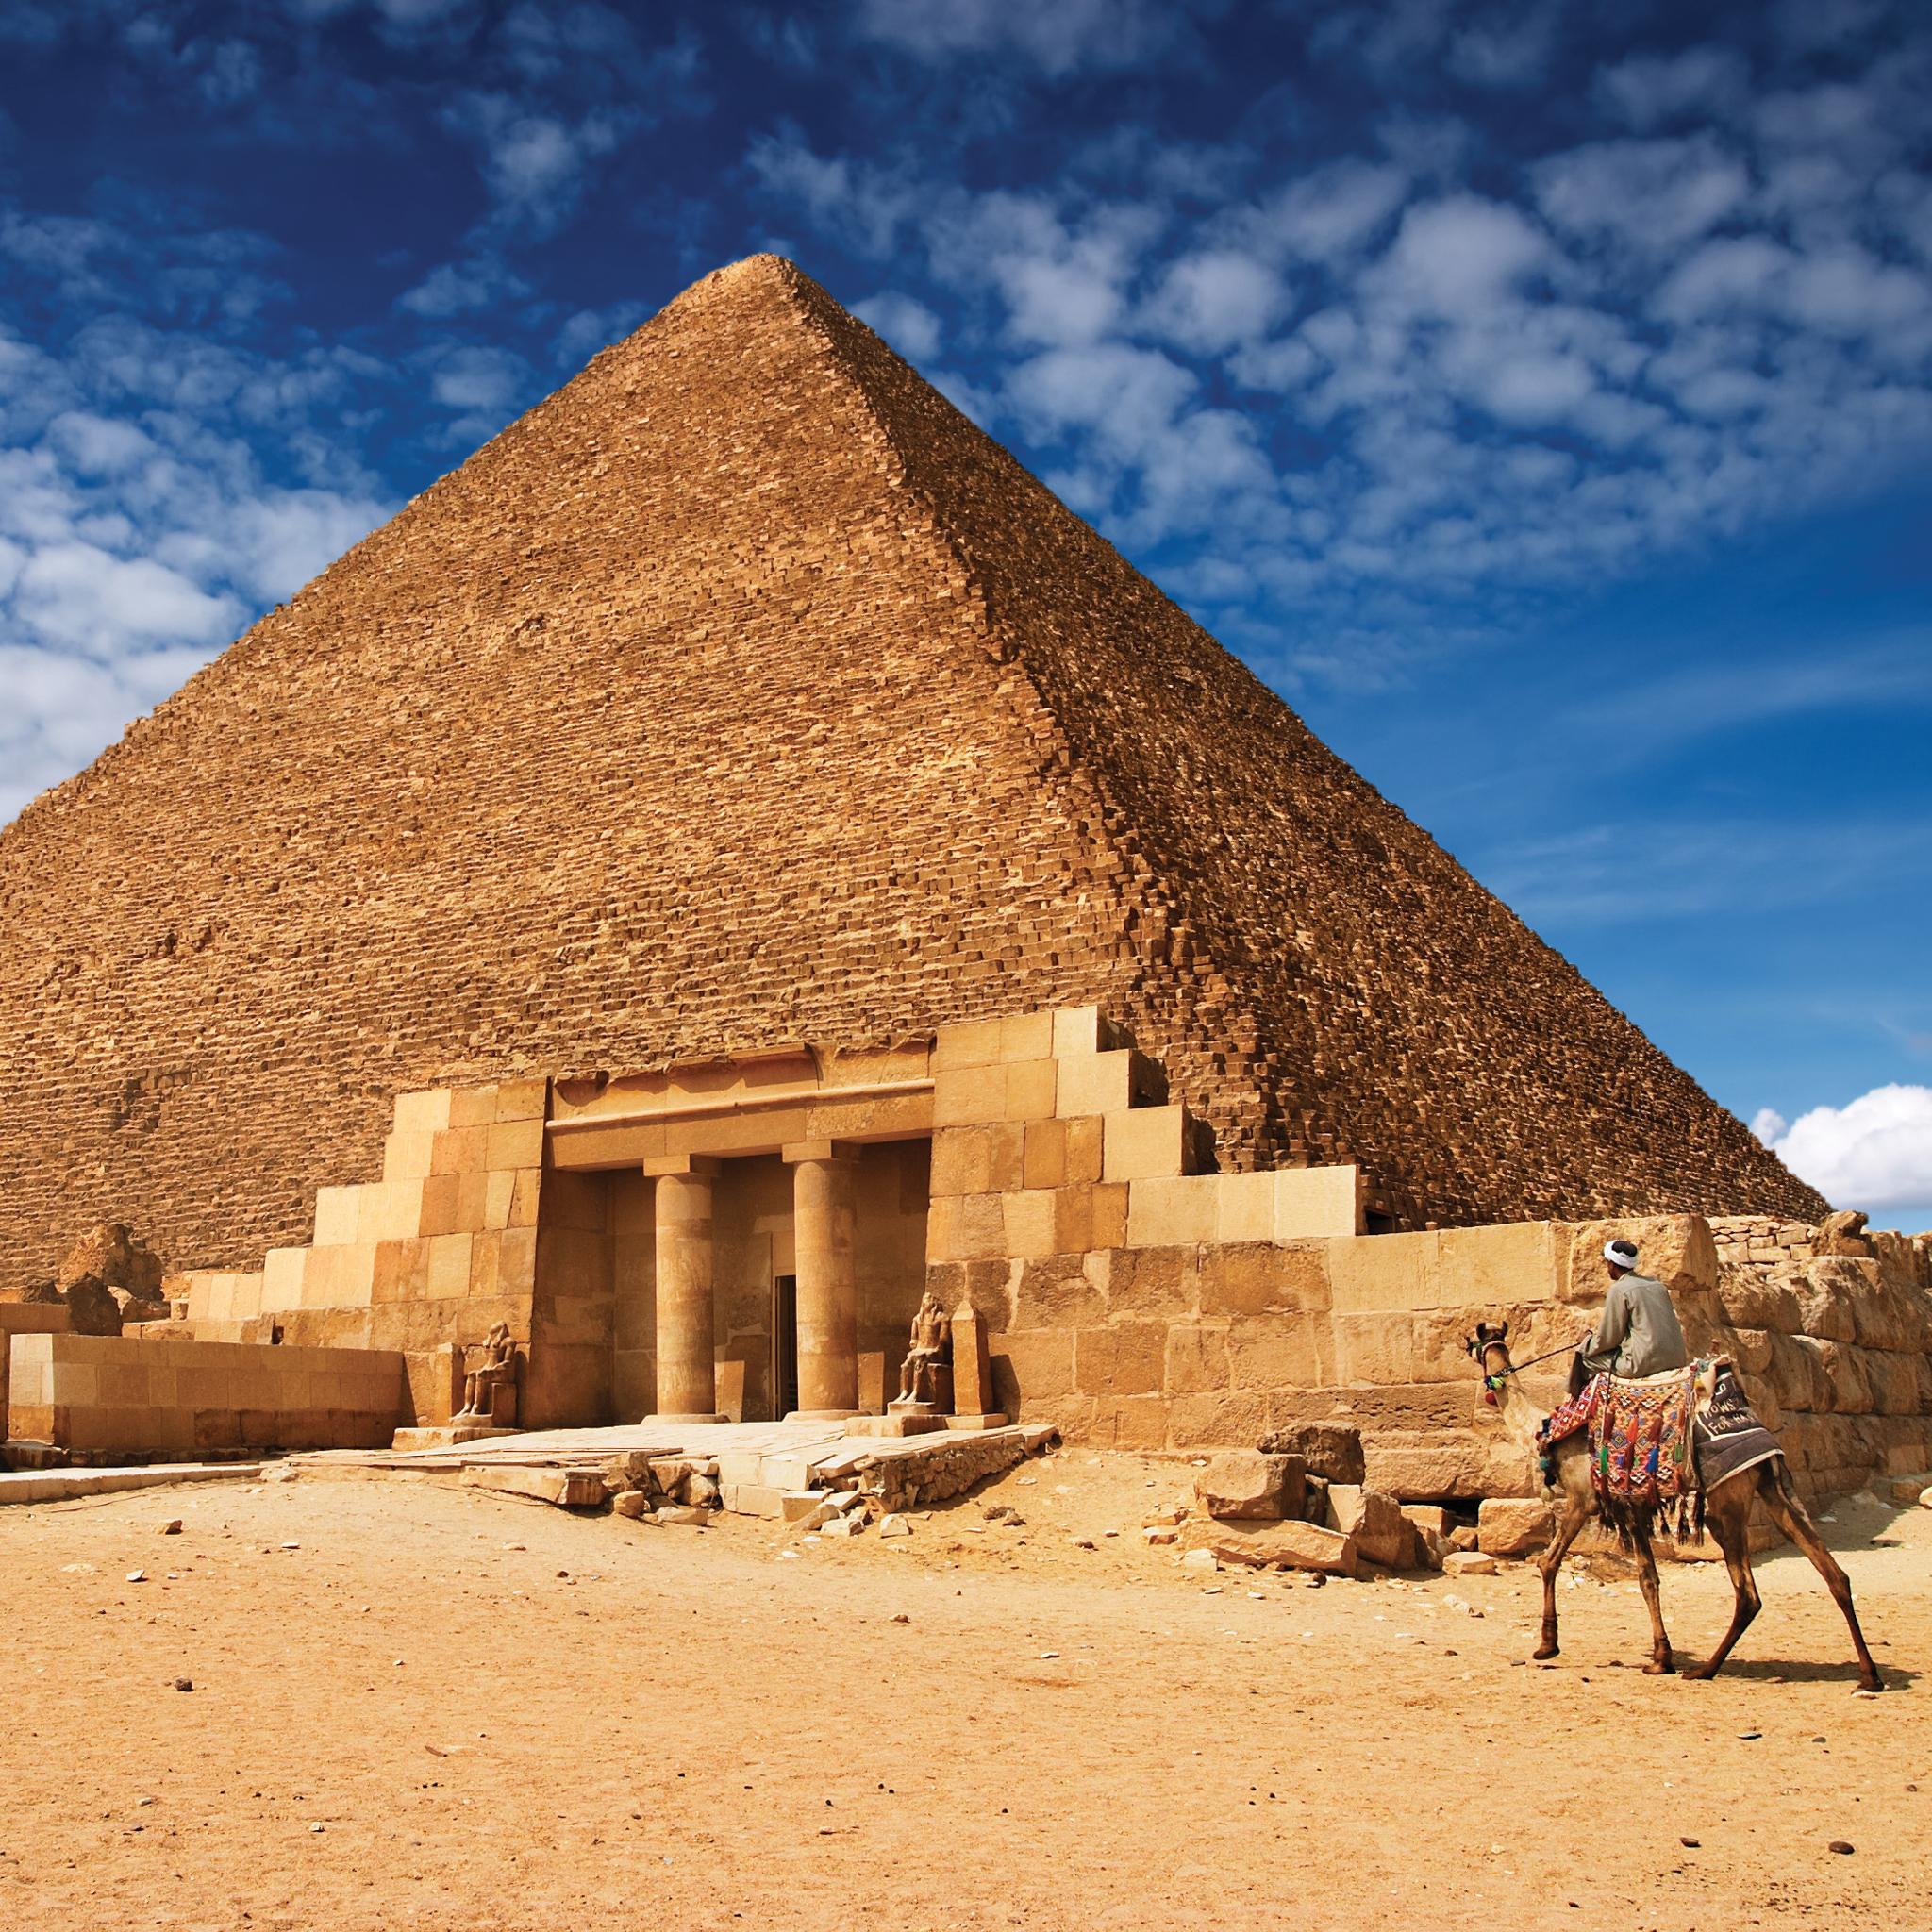 Egypt Pyramids 3Wallpapers iPad Retina Egypt Pyramids   iPad Retina